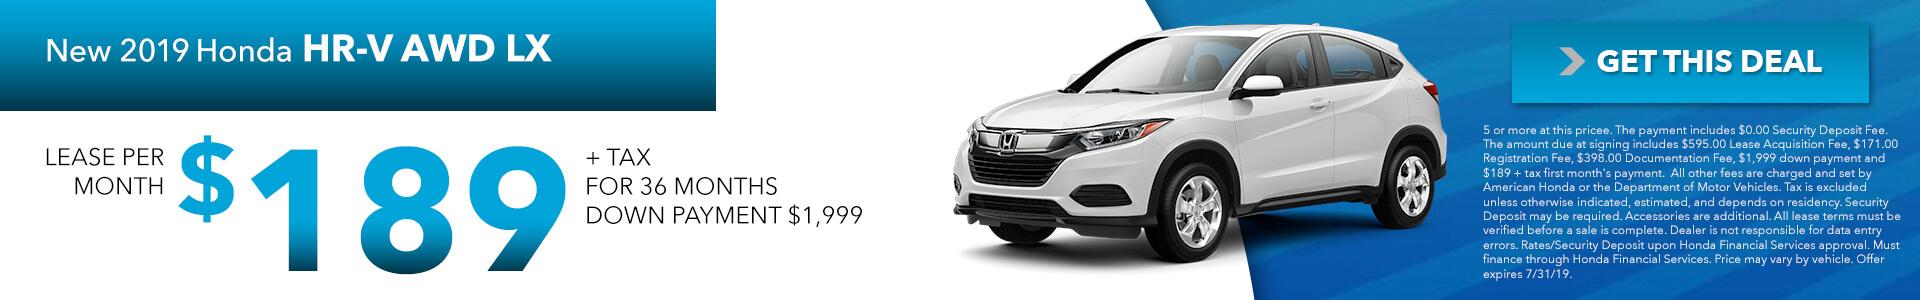 2019 Honda HR-V 189 Per Month